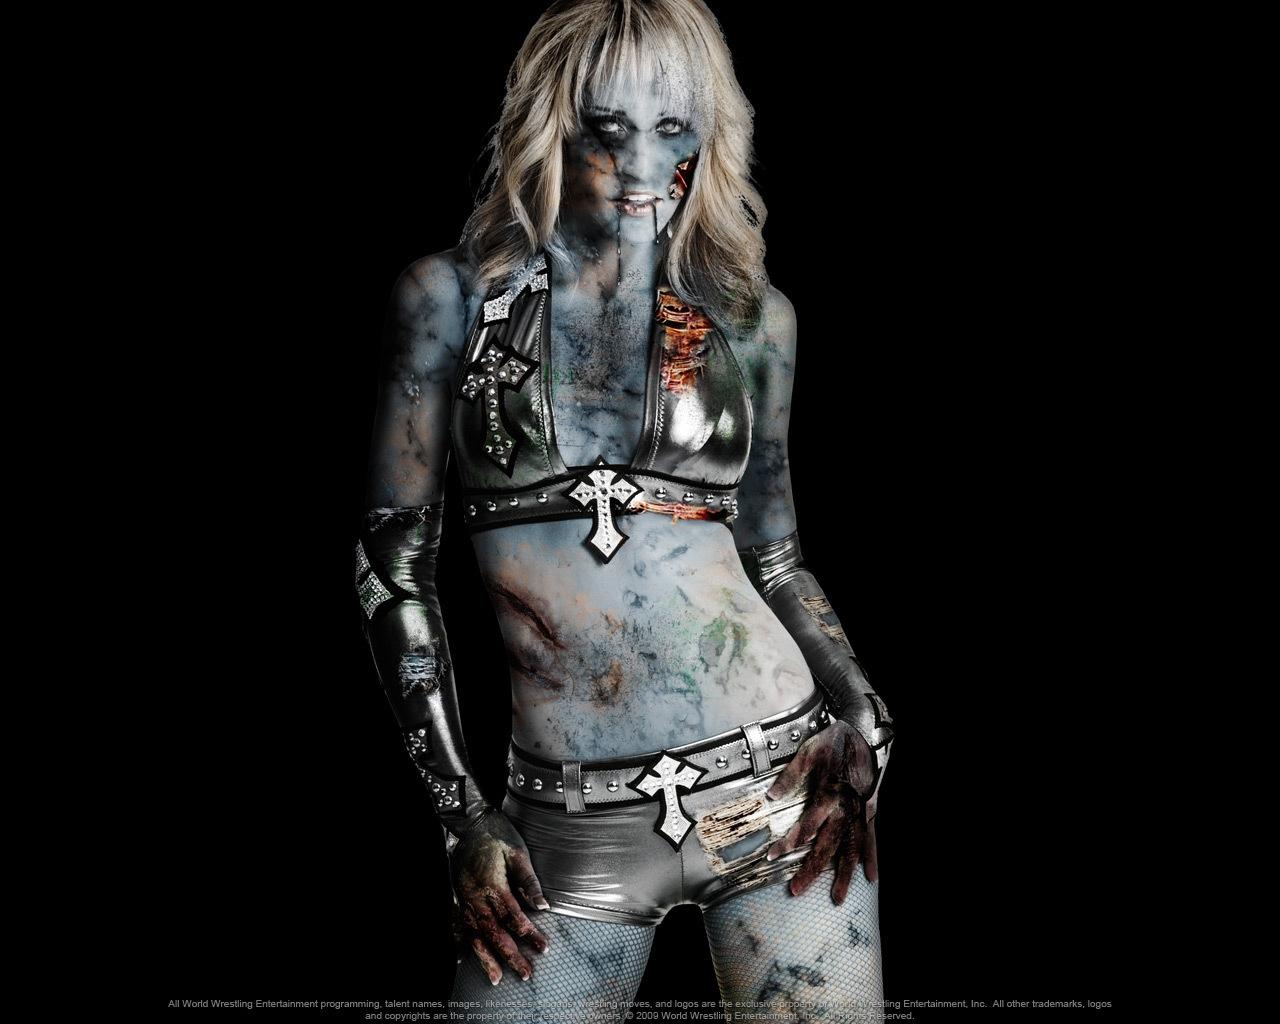 http://1.bp.blogspot.com/-BSJ_I67wmF0/Tkv3uwz0DBI/AAAAAAAABlc/jJRWiepLwic/s1600/WWE-Zombies-Michelle-McCool-michelle-mccool-8818178-1280-1024.jpg